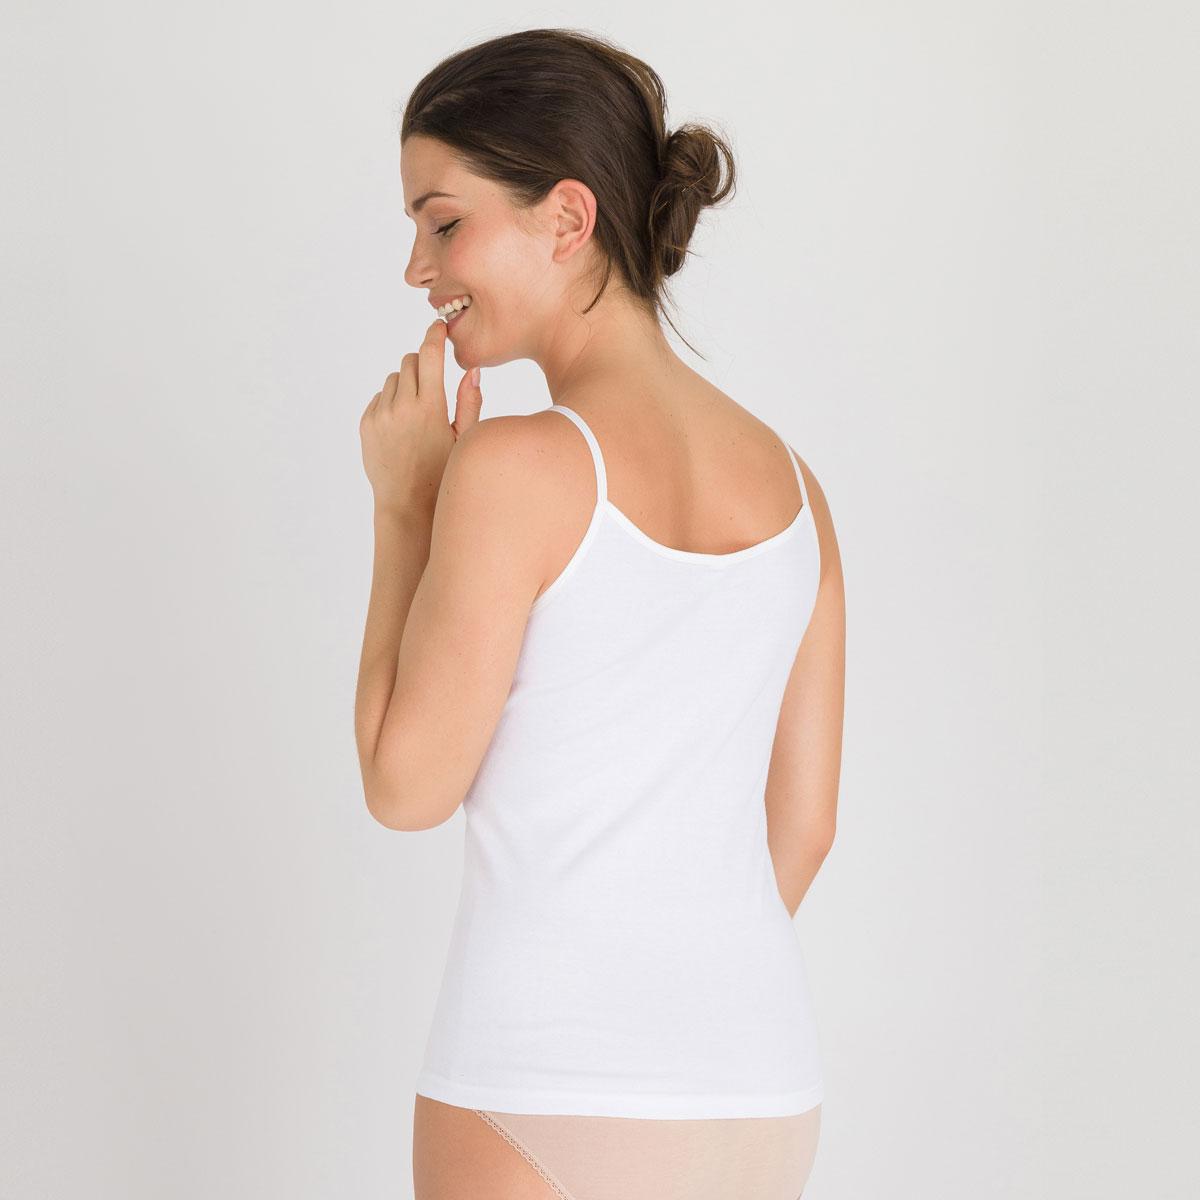 Caraco blanc - Cotton Feminine-PLAYTEX